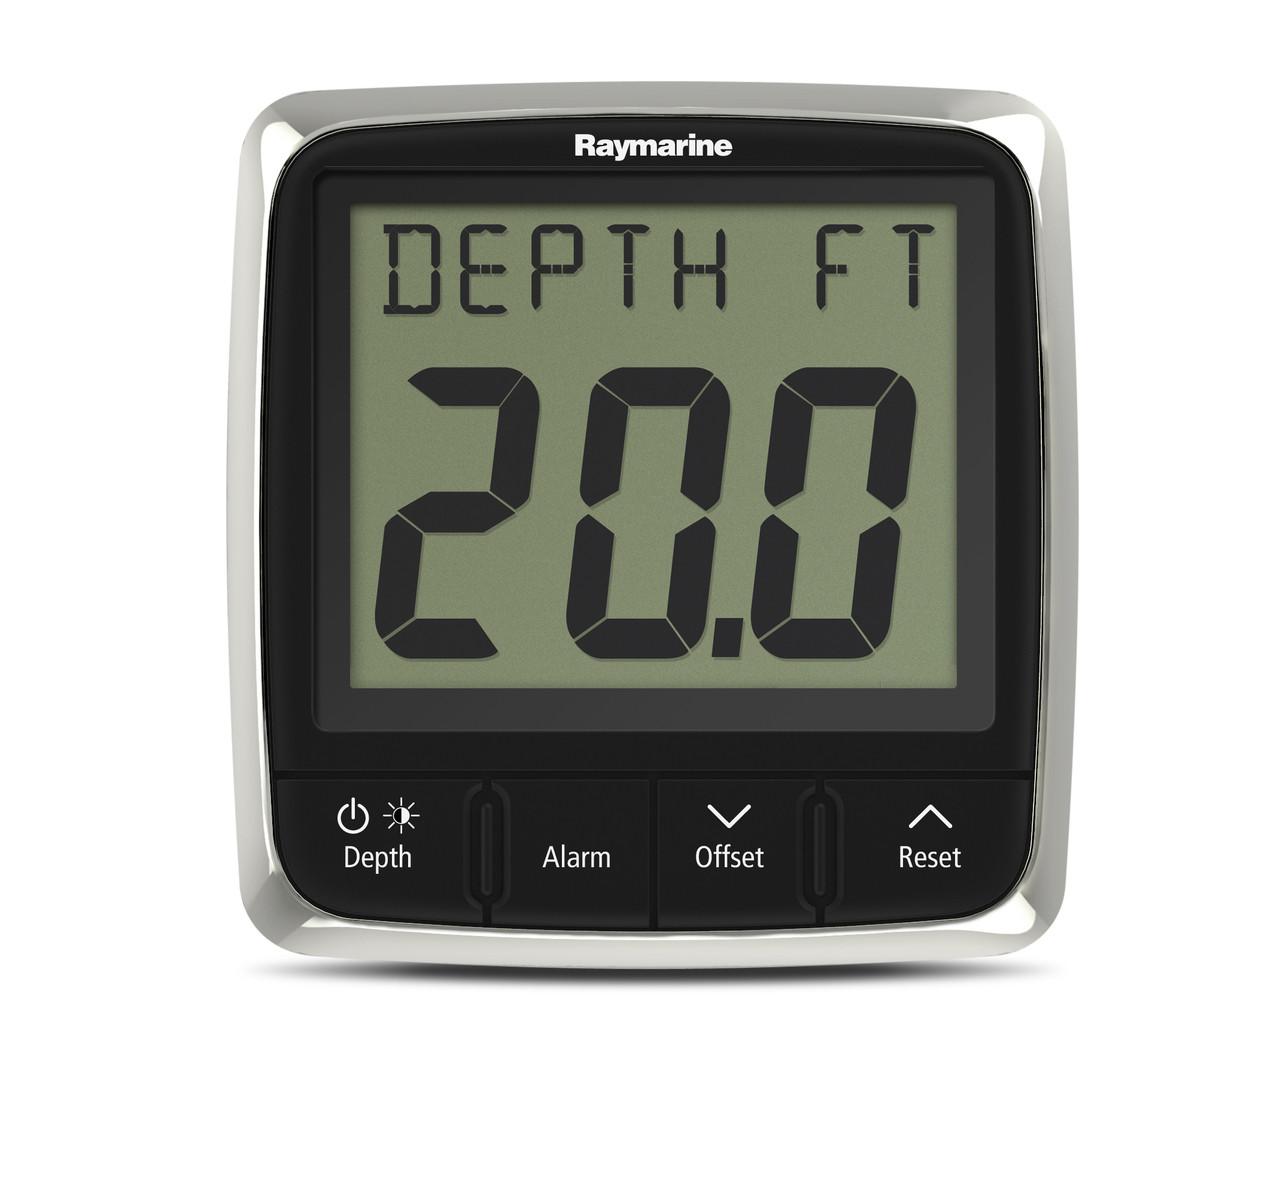 Raymarine i50 Depth Instrument Display